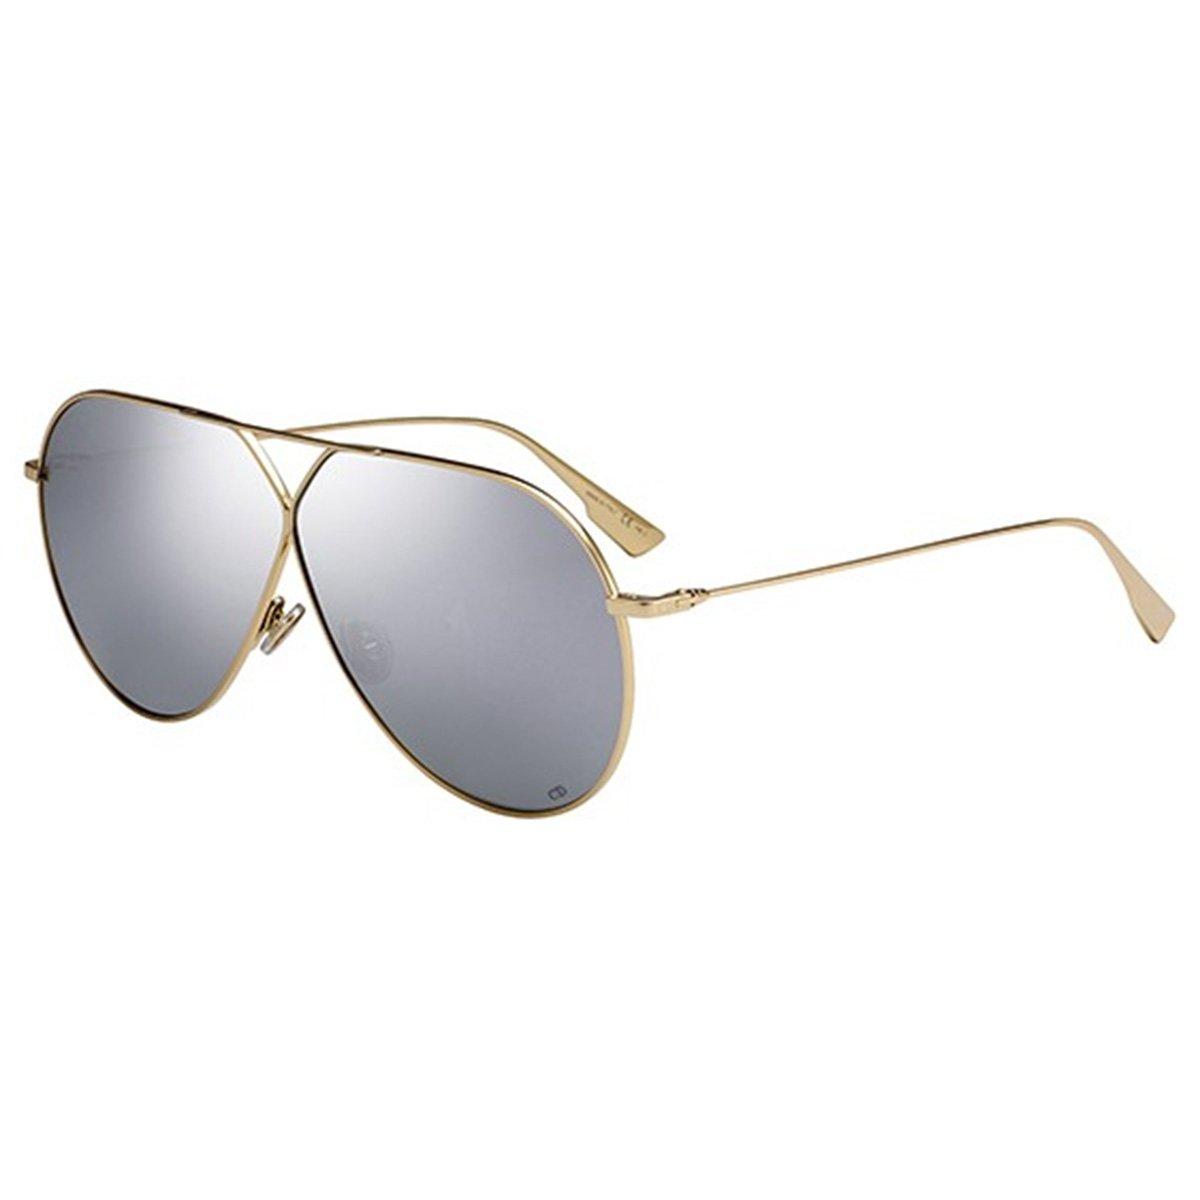 Compre Óculos de Sol Dior Stellaire 3 em 10X   Tri-Jóia Shop 45a12f039f